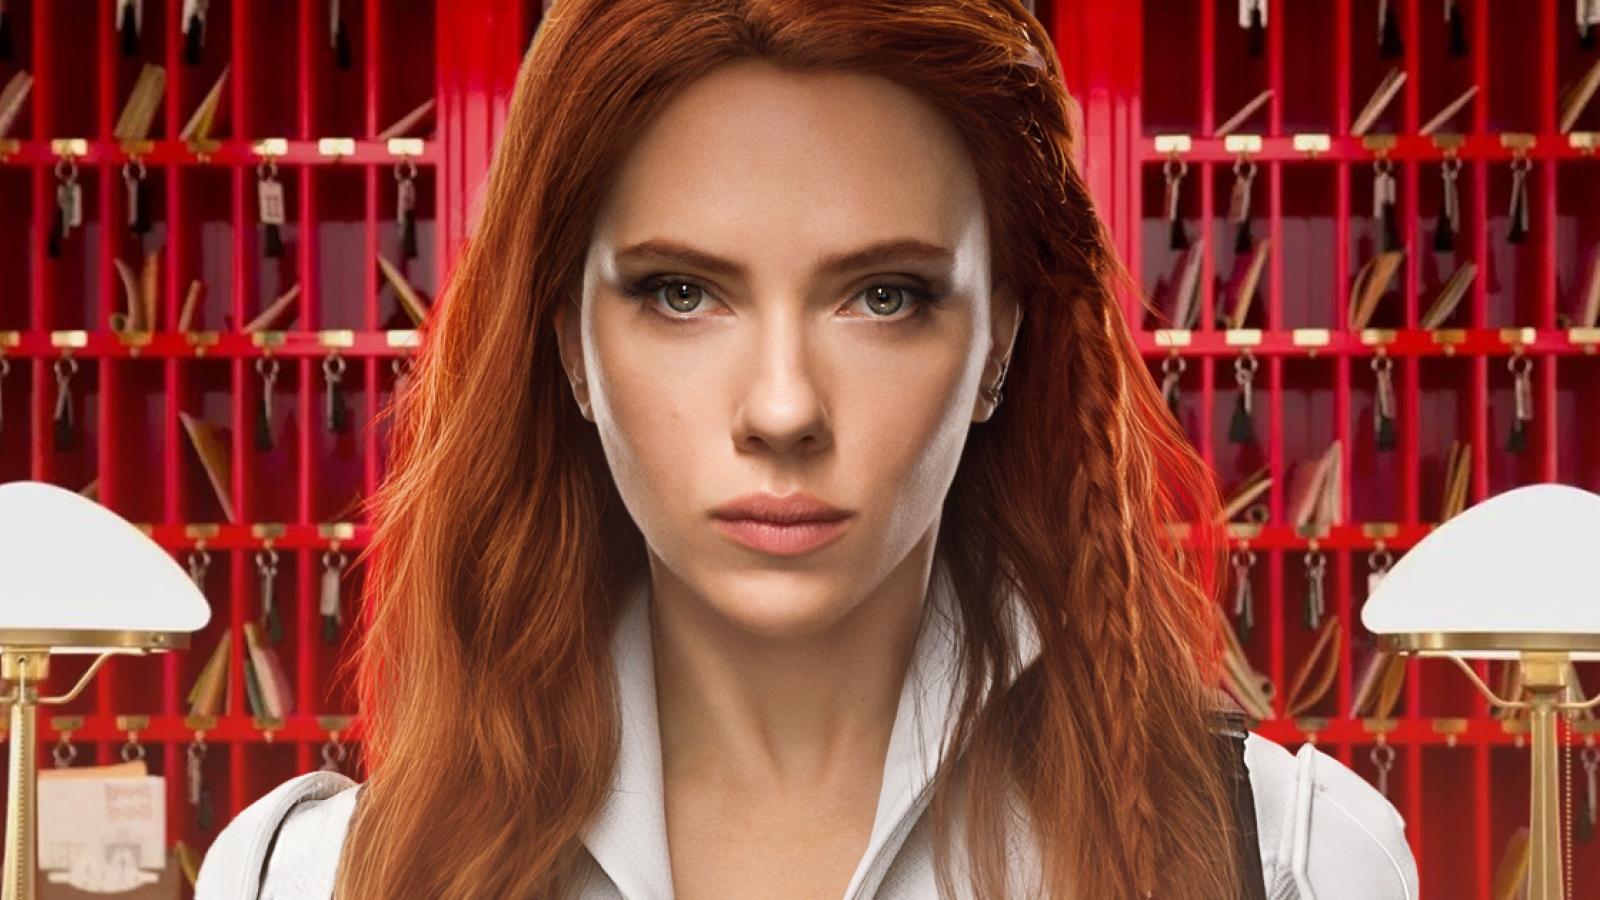 Ngôi sao Marvel Scarlett Johanssontham gia phim mới cùng Tom Hanks, Margot Robbie